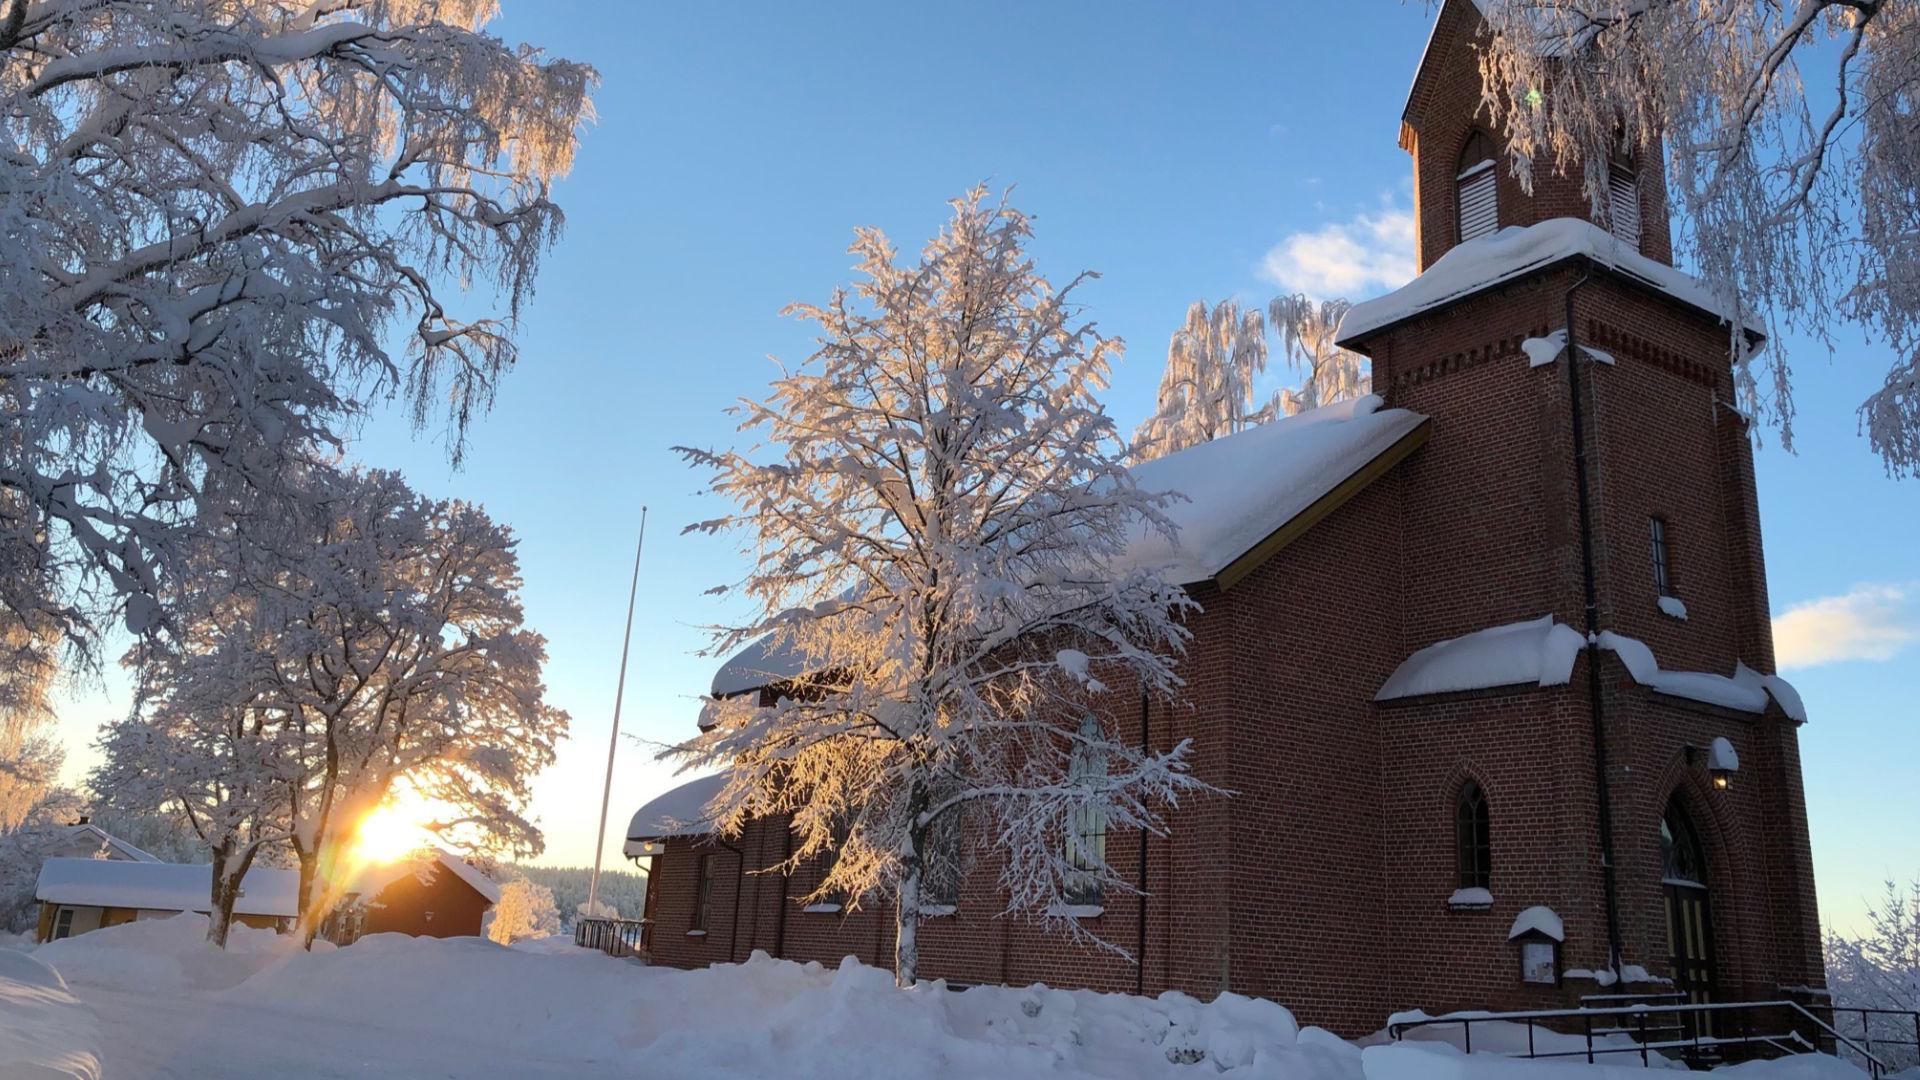 Julegudstjeneste fra Snarum kirke